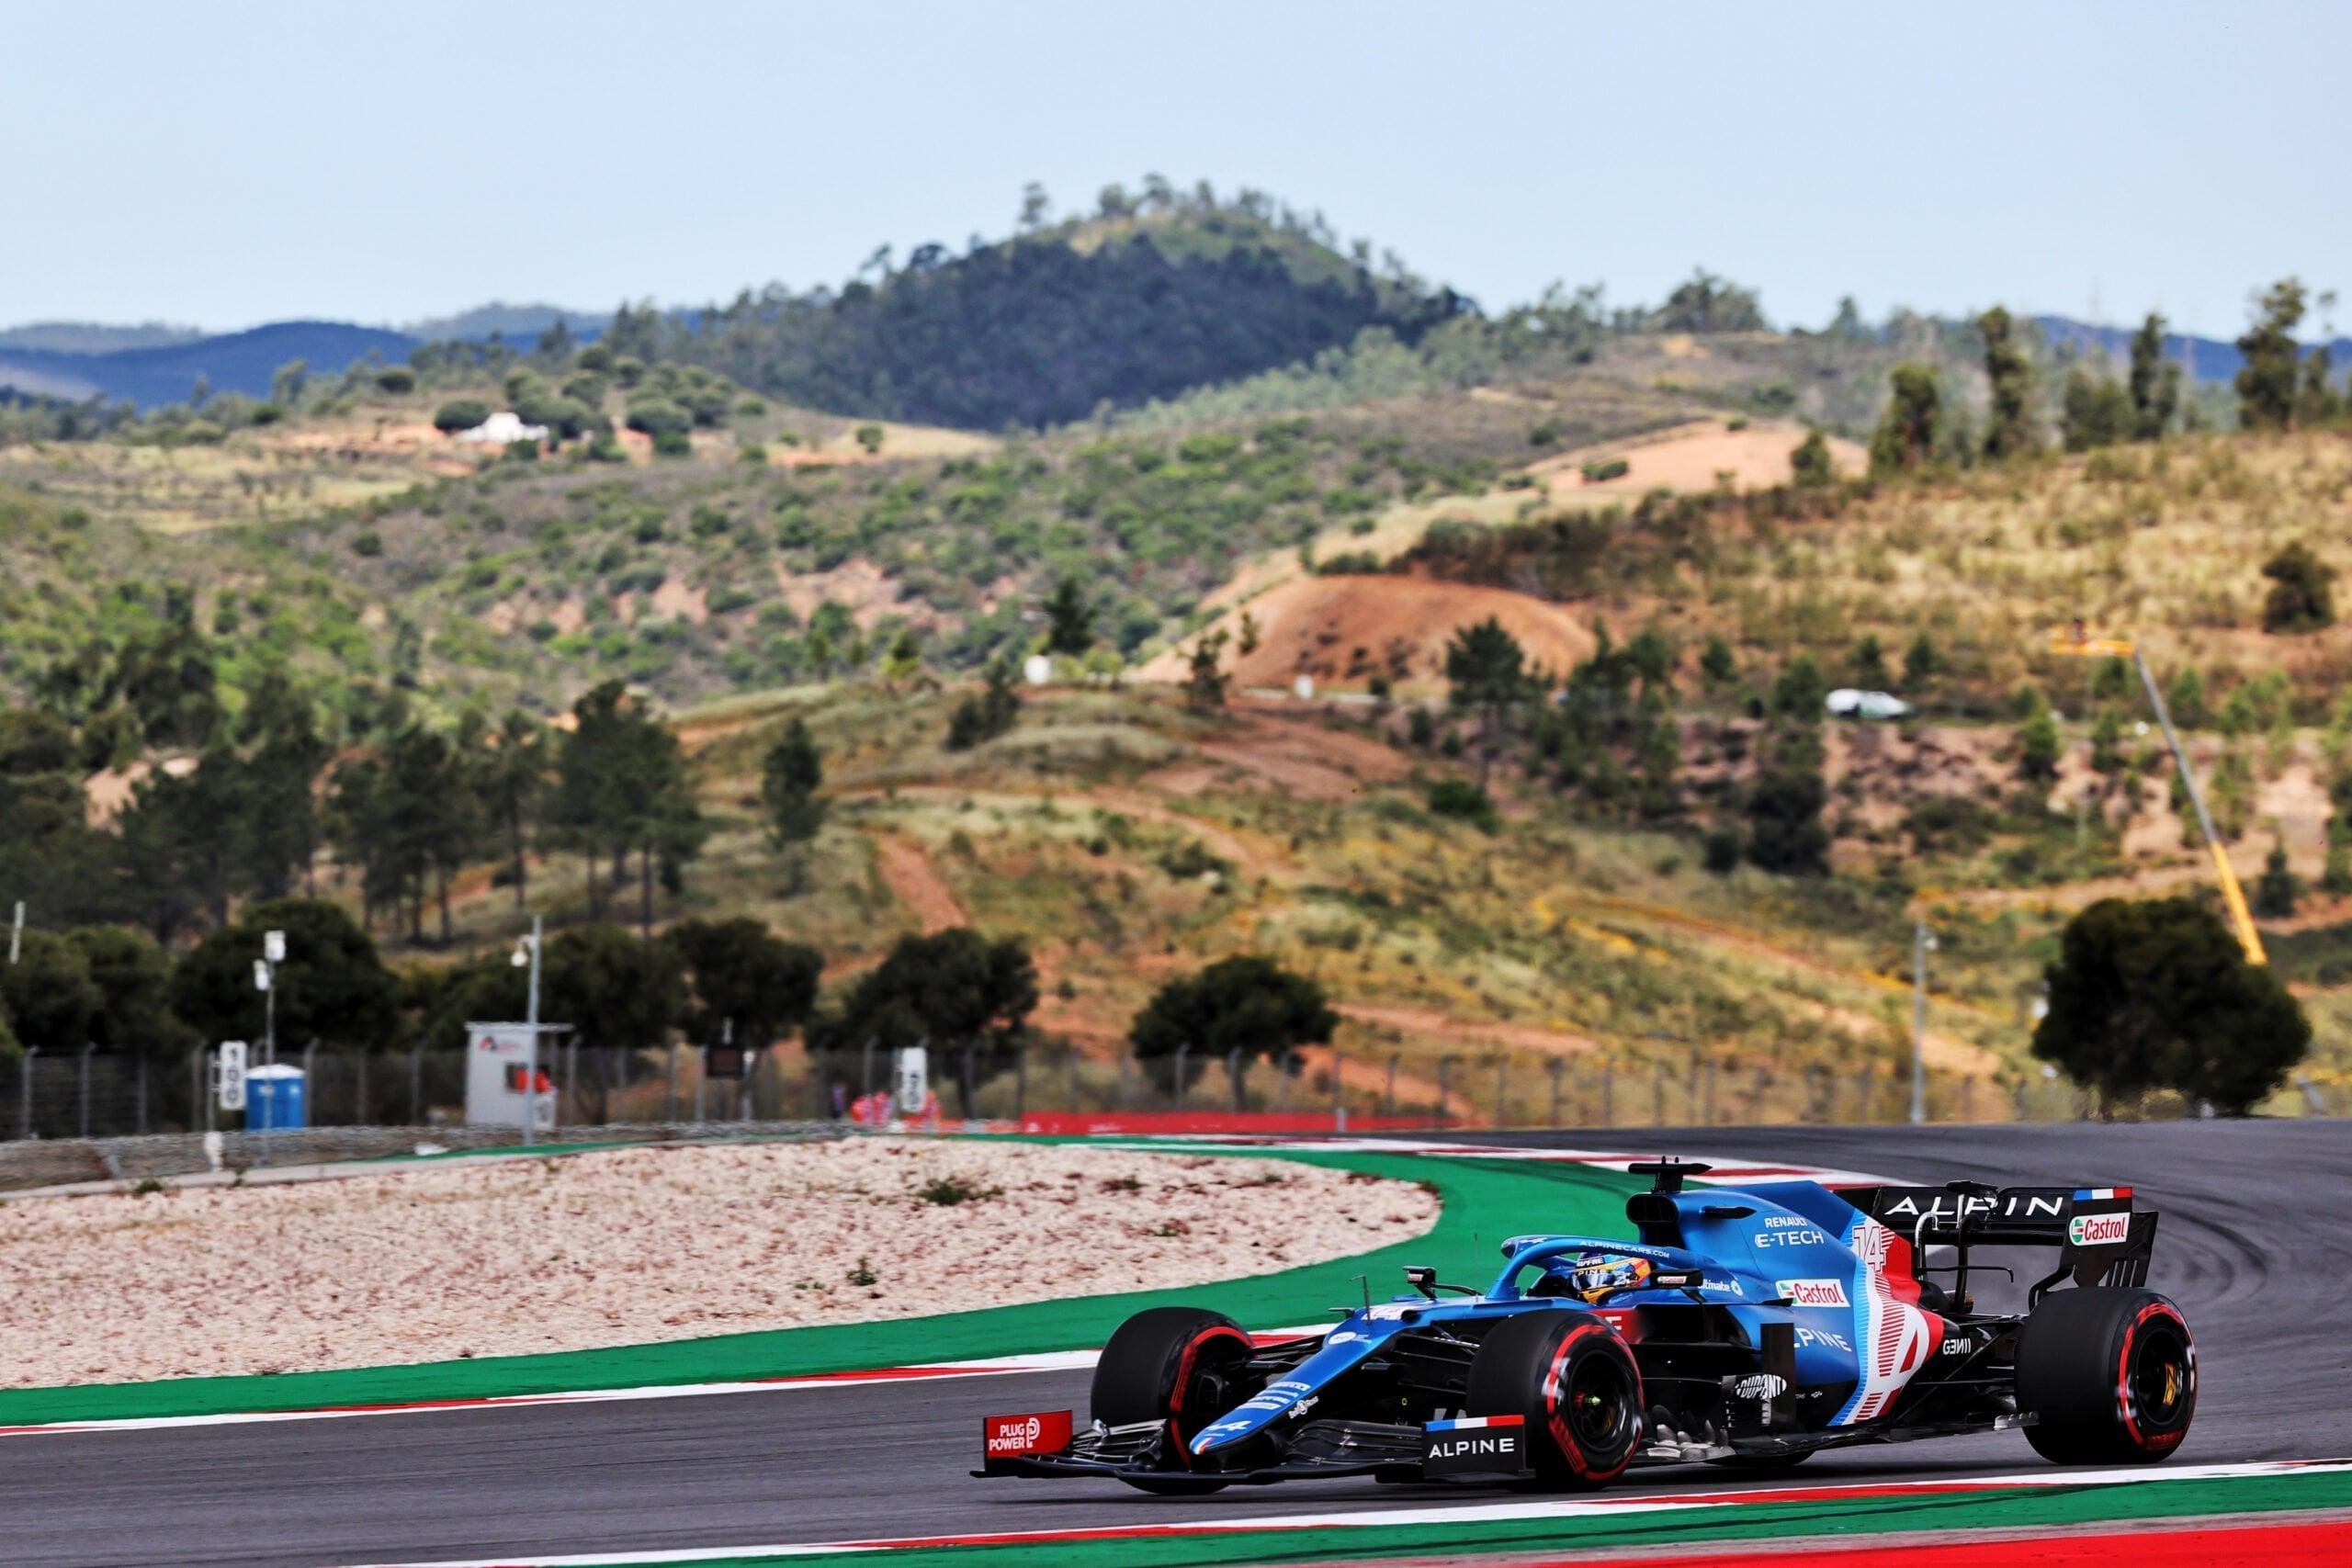 Alpine F1 Team GRAND PRIX HEINEKEN DU PORTUGAL Alonso Ocon 2021 A521 27 scaled   Alpine F1 Team : des essais convaincants au Grand Prix Heineken du Portugal